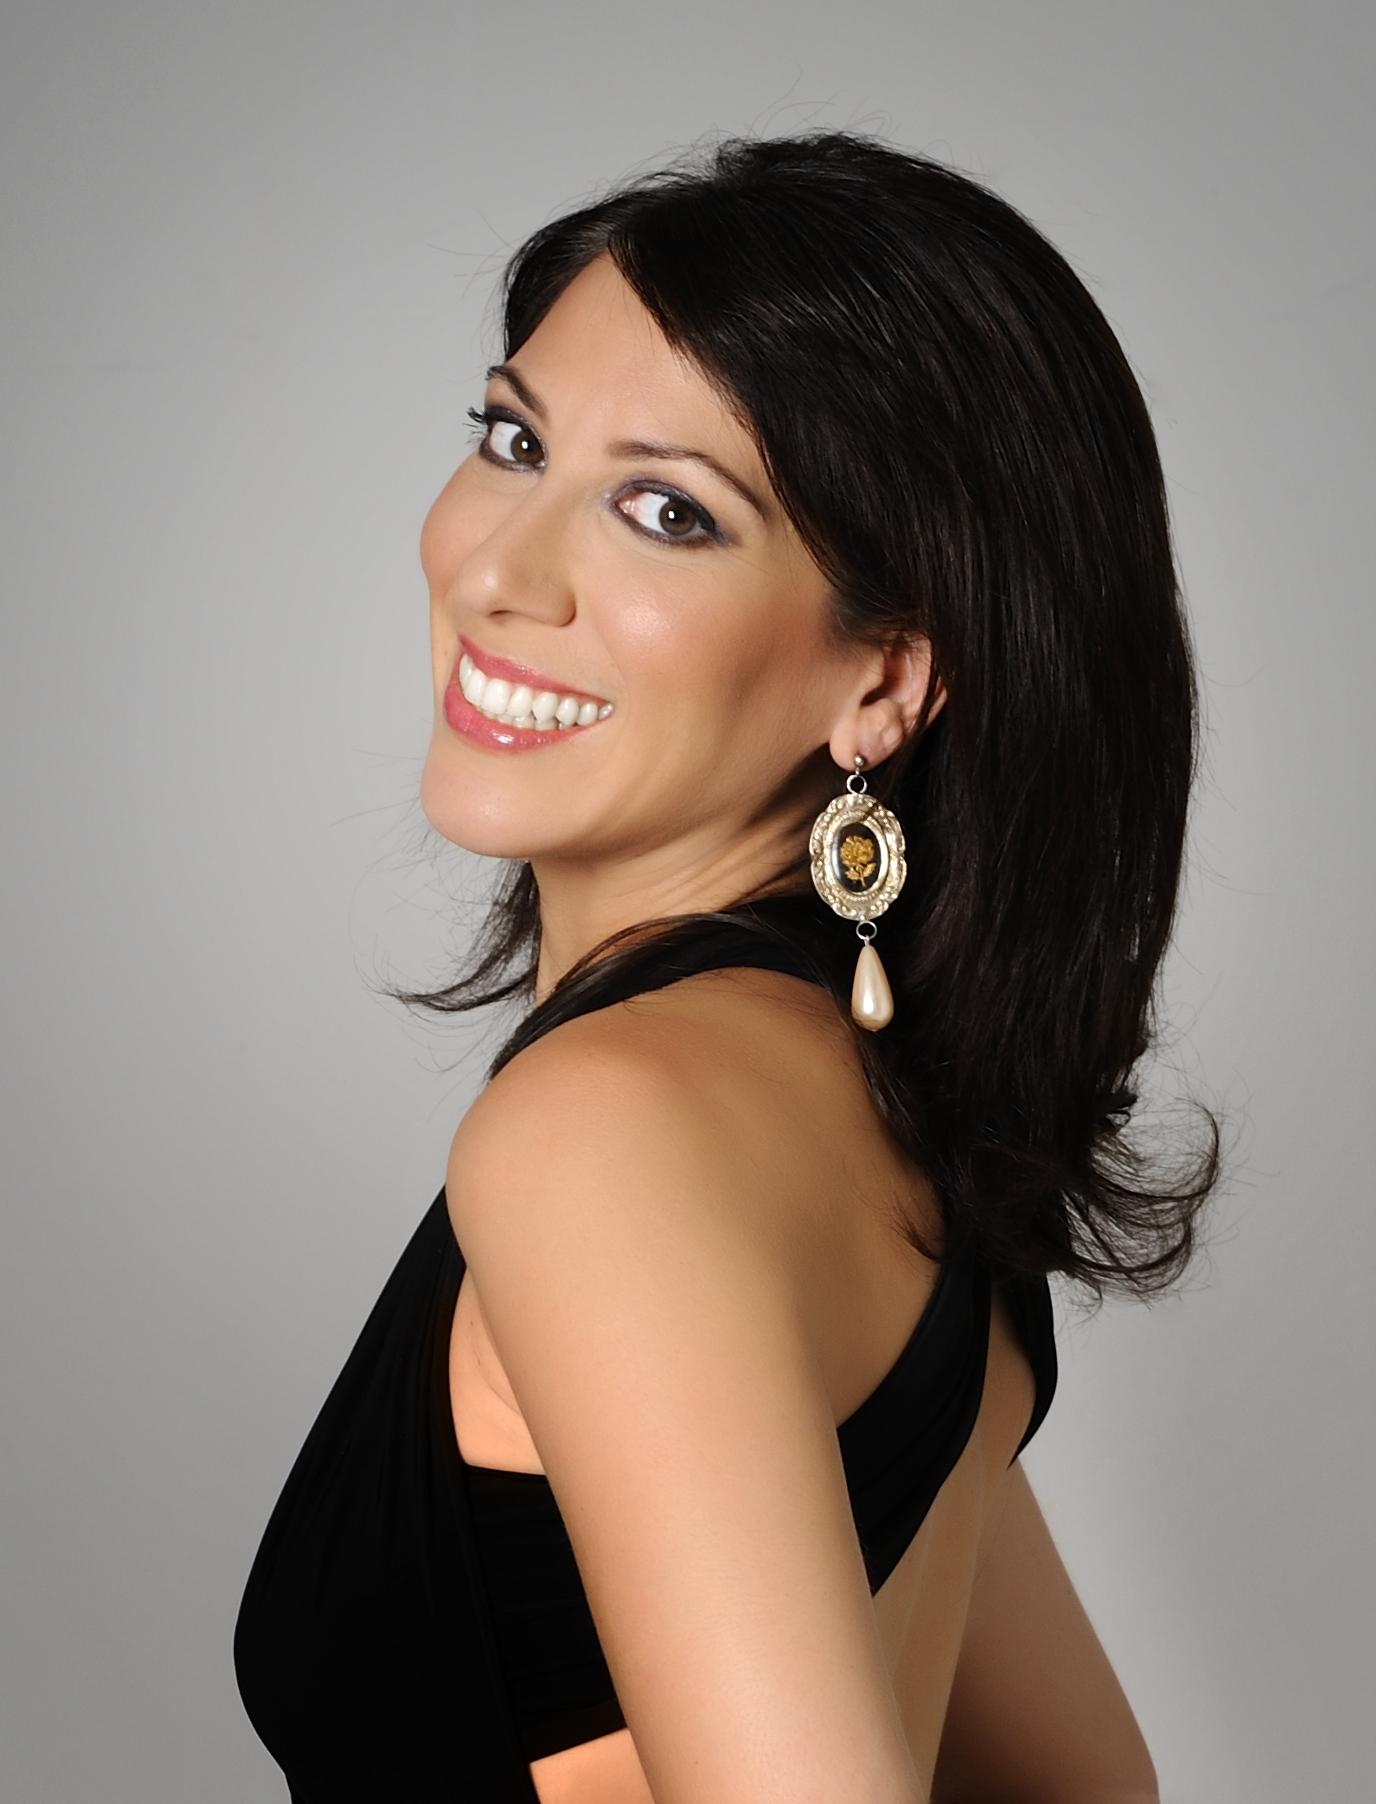 Eleni Calenos Headshot APPROVED.JPG